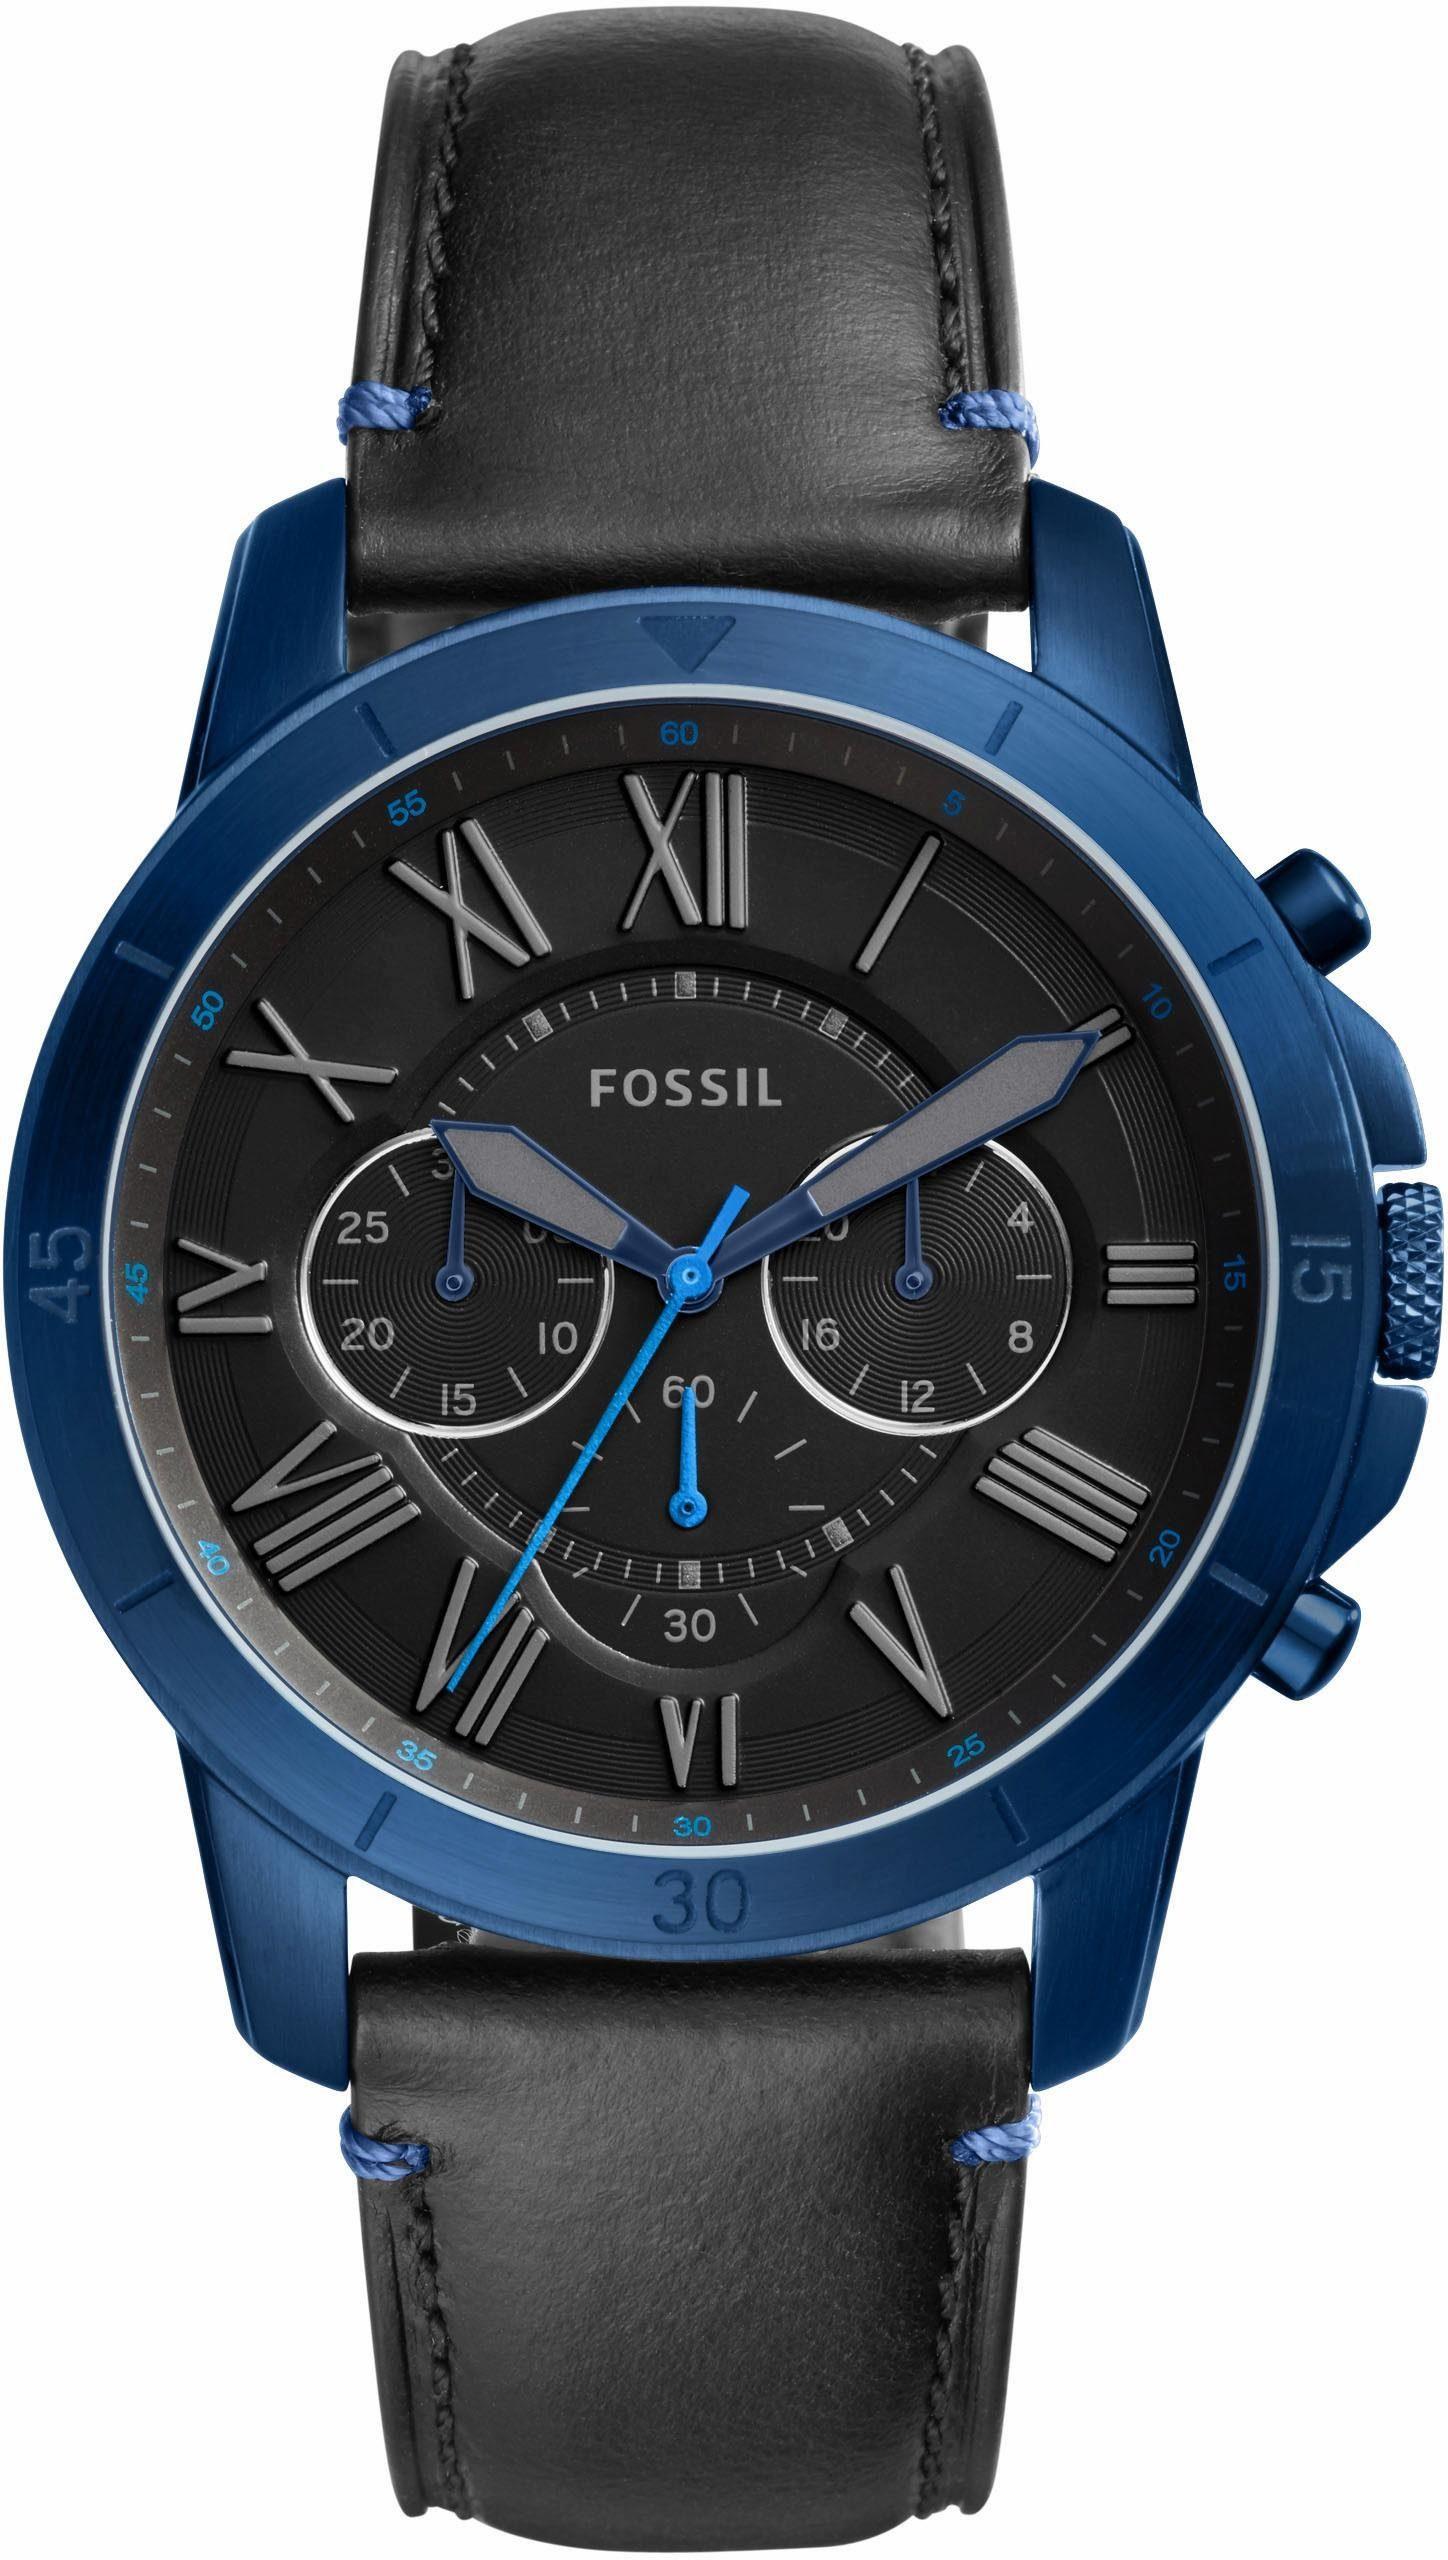 Fossil Chronograph »GRANT SPORT, FS5342«